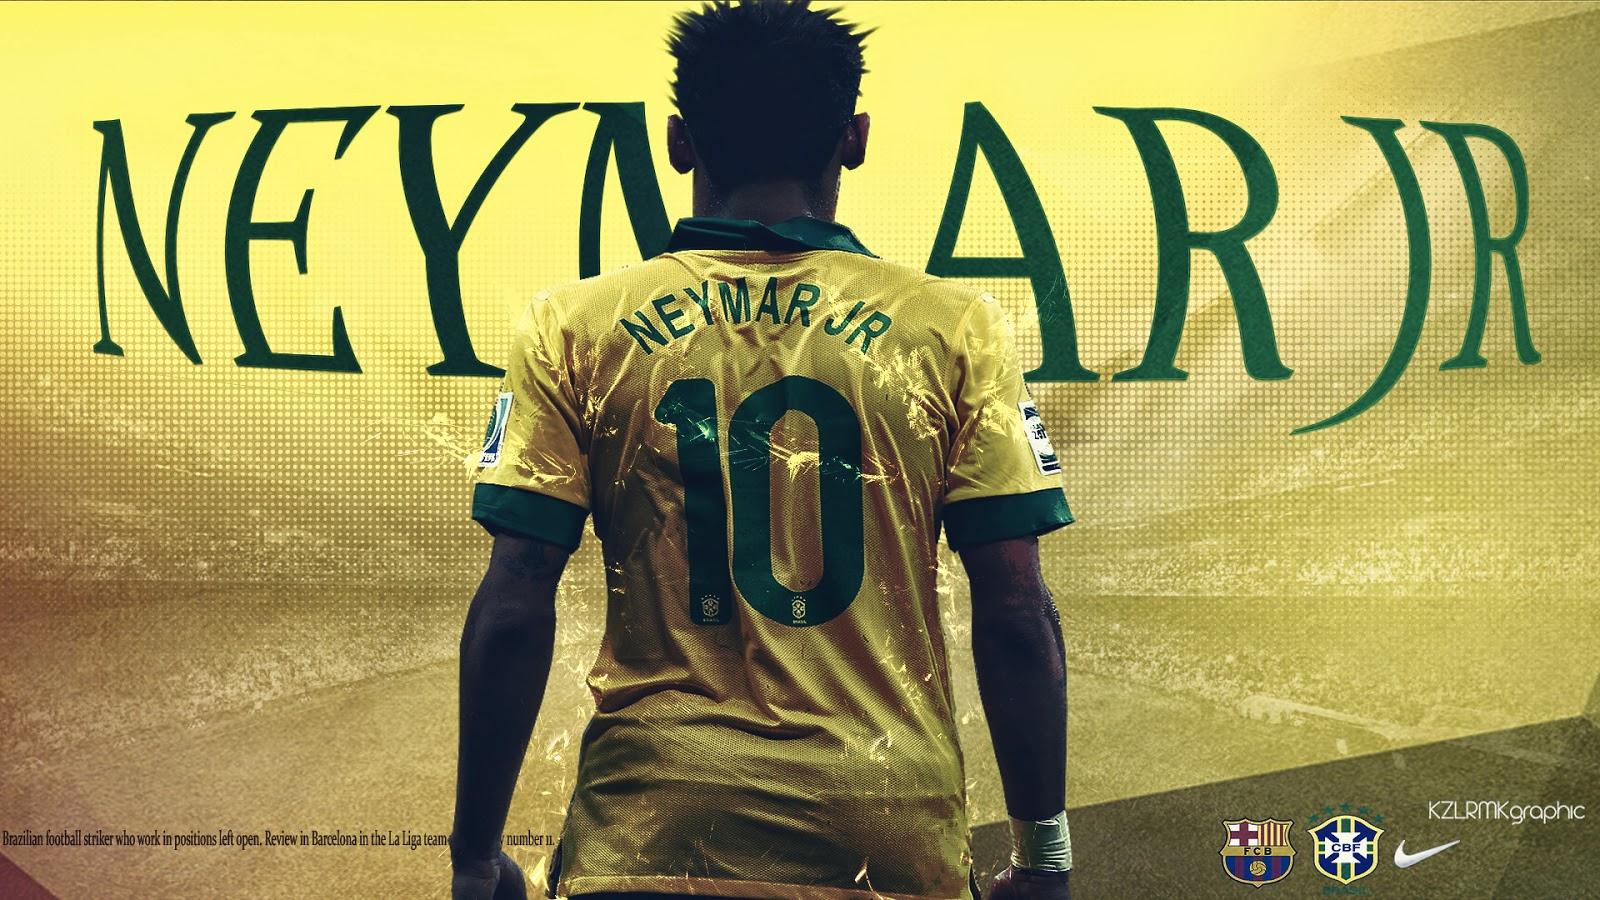 neymar-wallpaper-brazil-خلفيات-نيمار-فى-البرازيل-HD